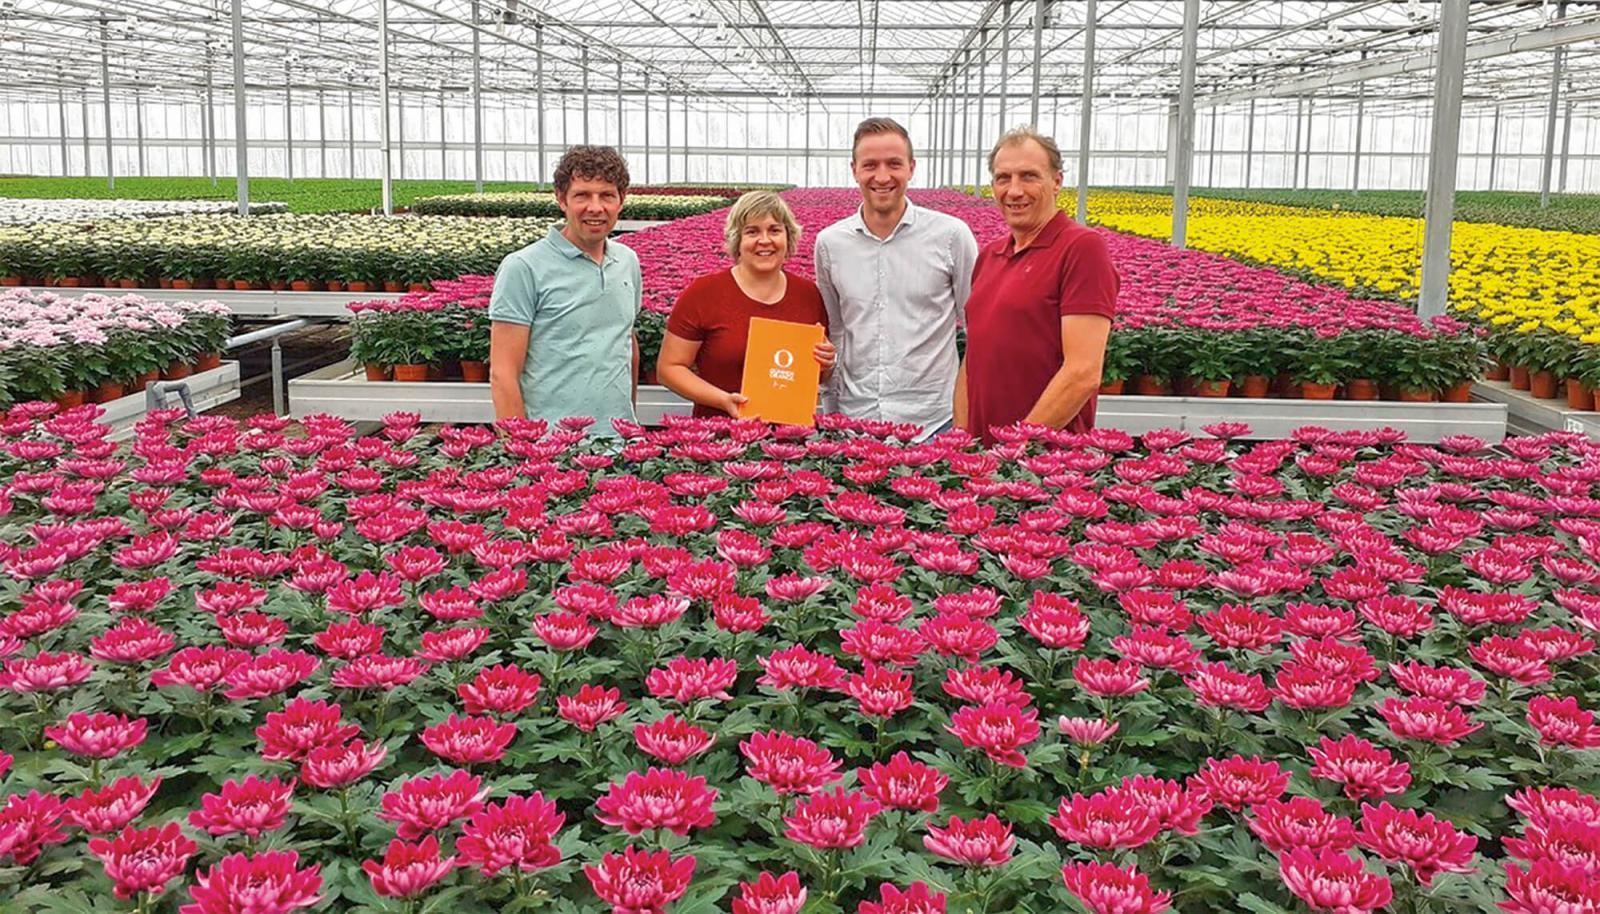 Left to right: Marcel van der Voort (owner of Van Schie),  Noëlia Mansilla (president EMEA of Dümmen Orange),  Mike van Os (global product manager, pot plants for Dümmen Orange) and Hans van Leeuwen (owner of Lionplant).